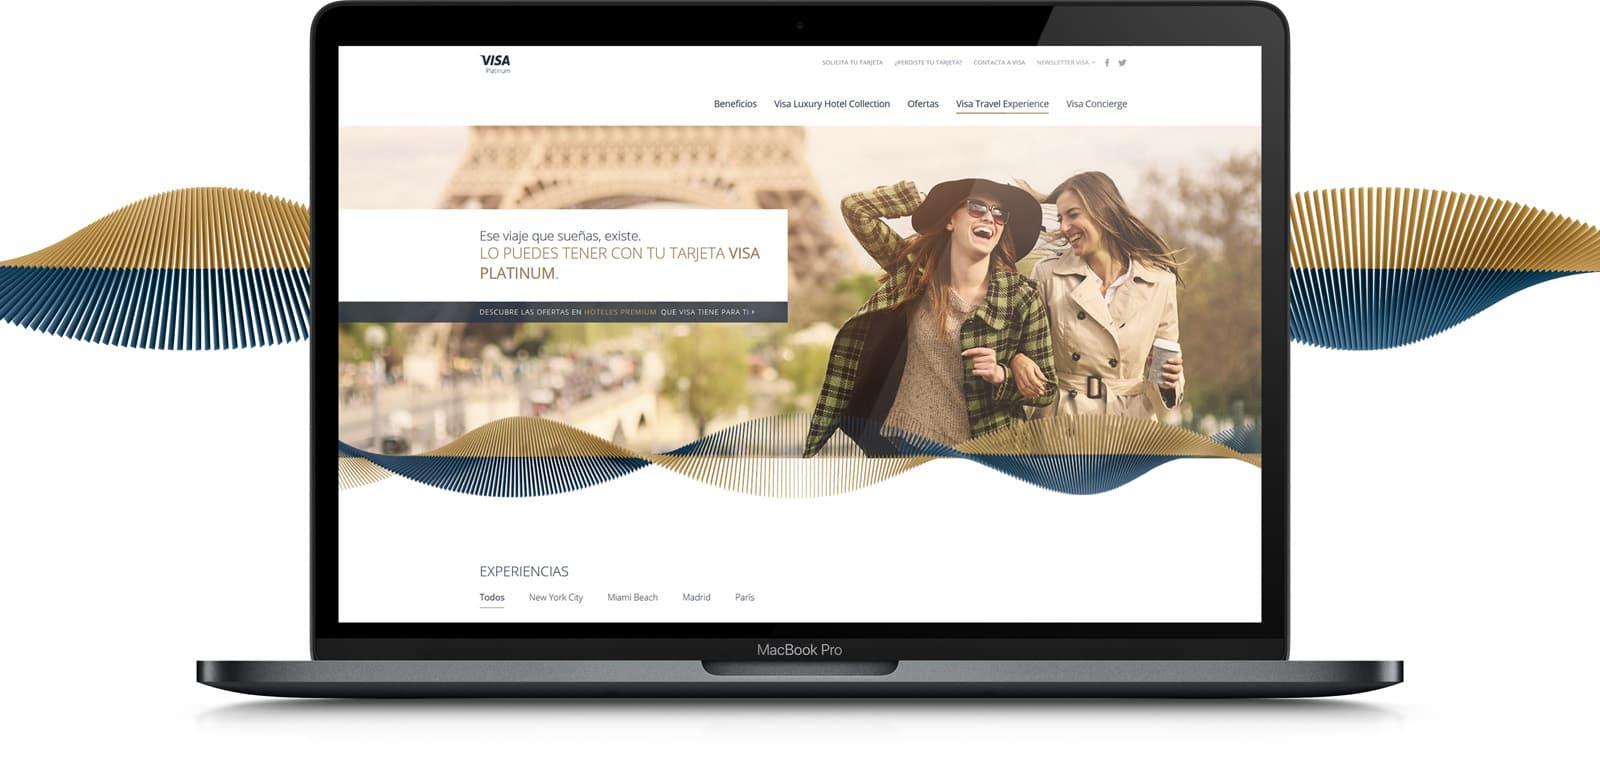 Visa Affluent - MacBook Pro